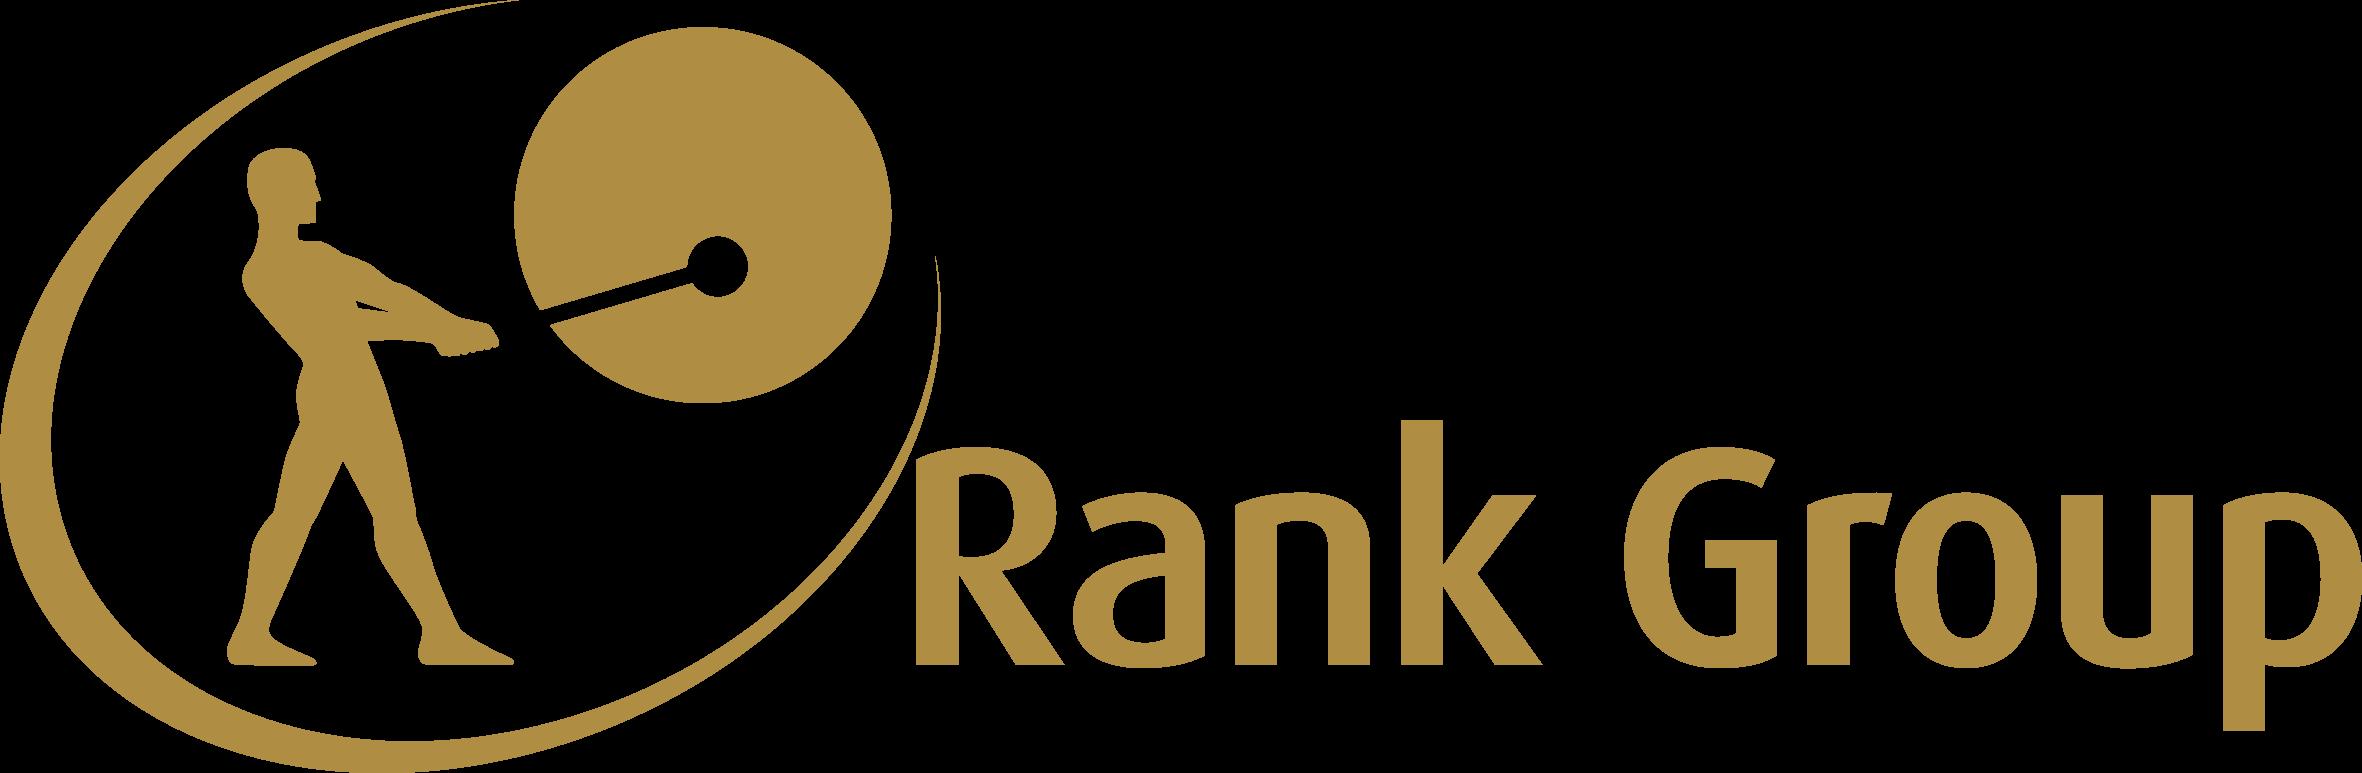 RANK GROUP PLC Logo